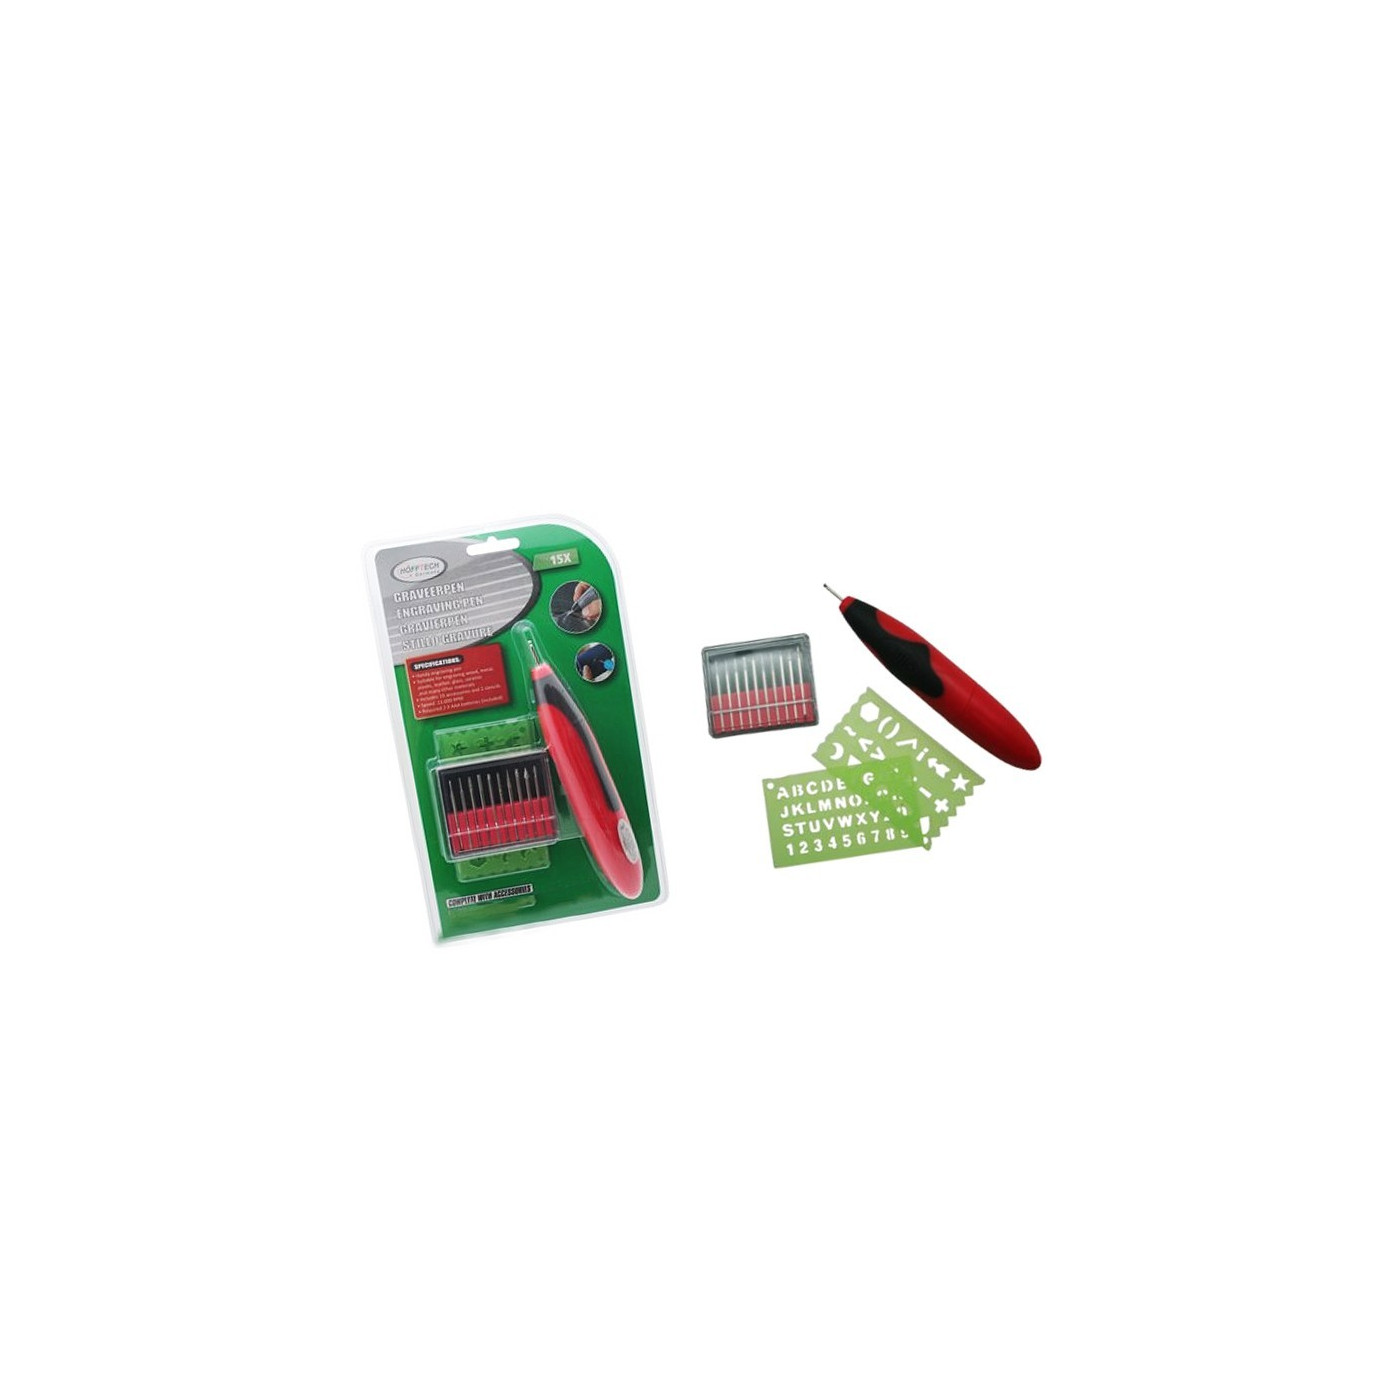 Mini grabador con accesorios (con pilas)  - 1